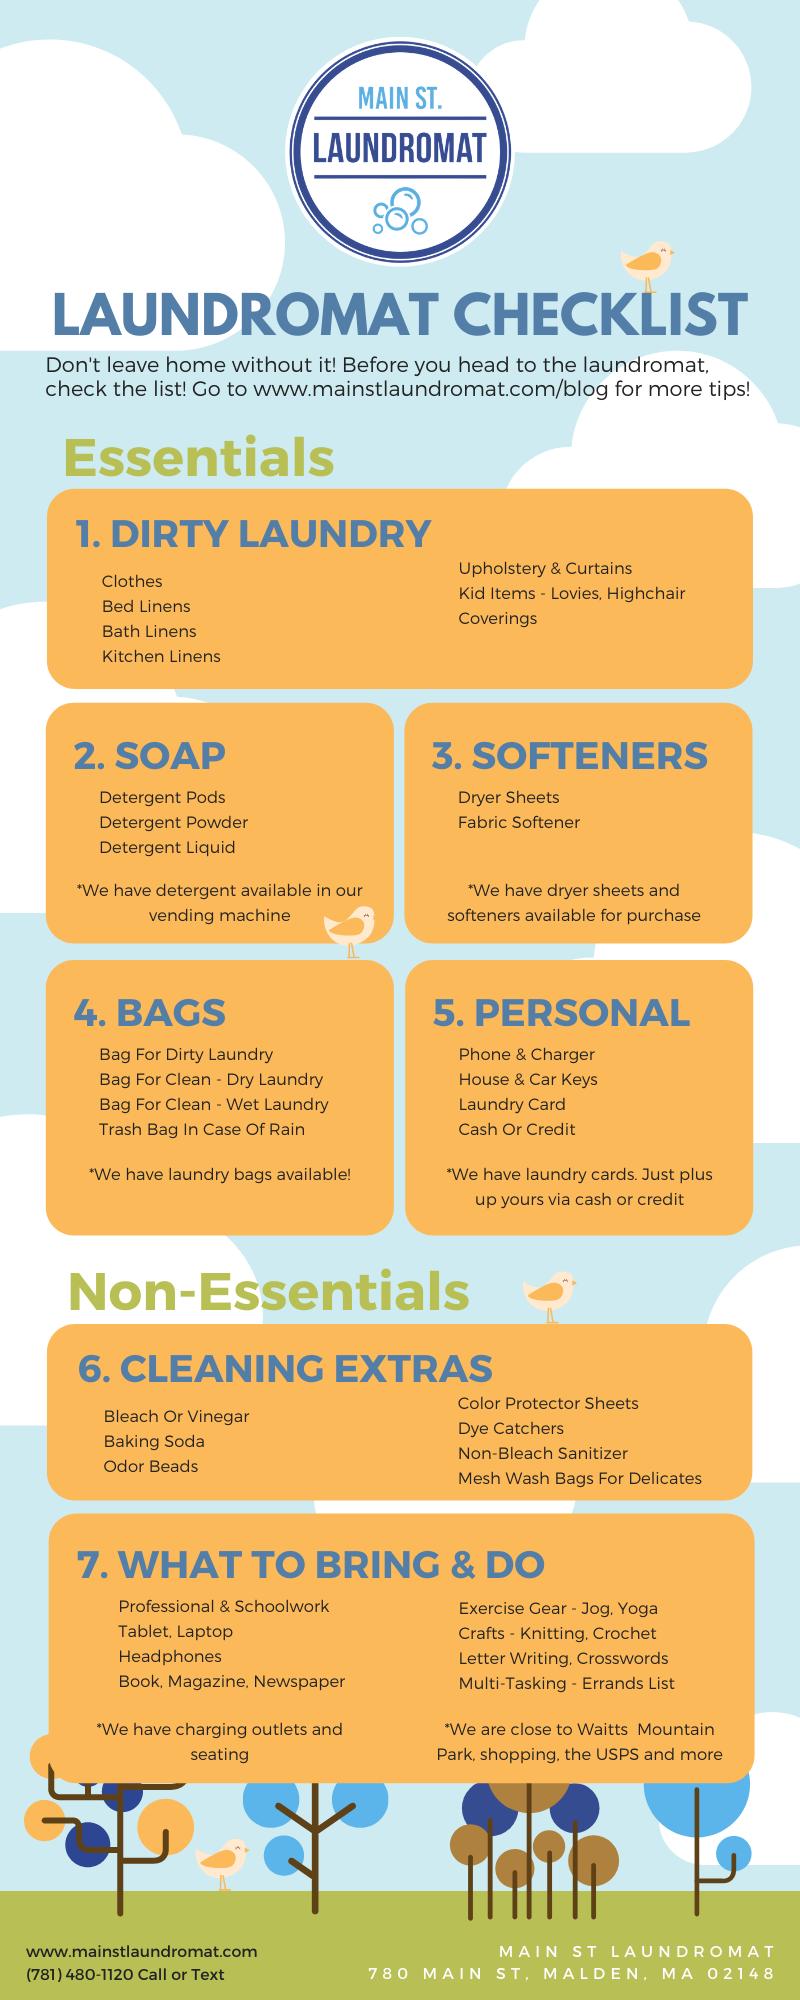 Laundromat checklist